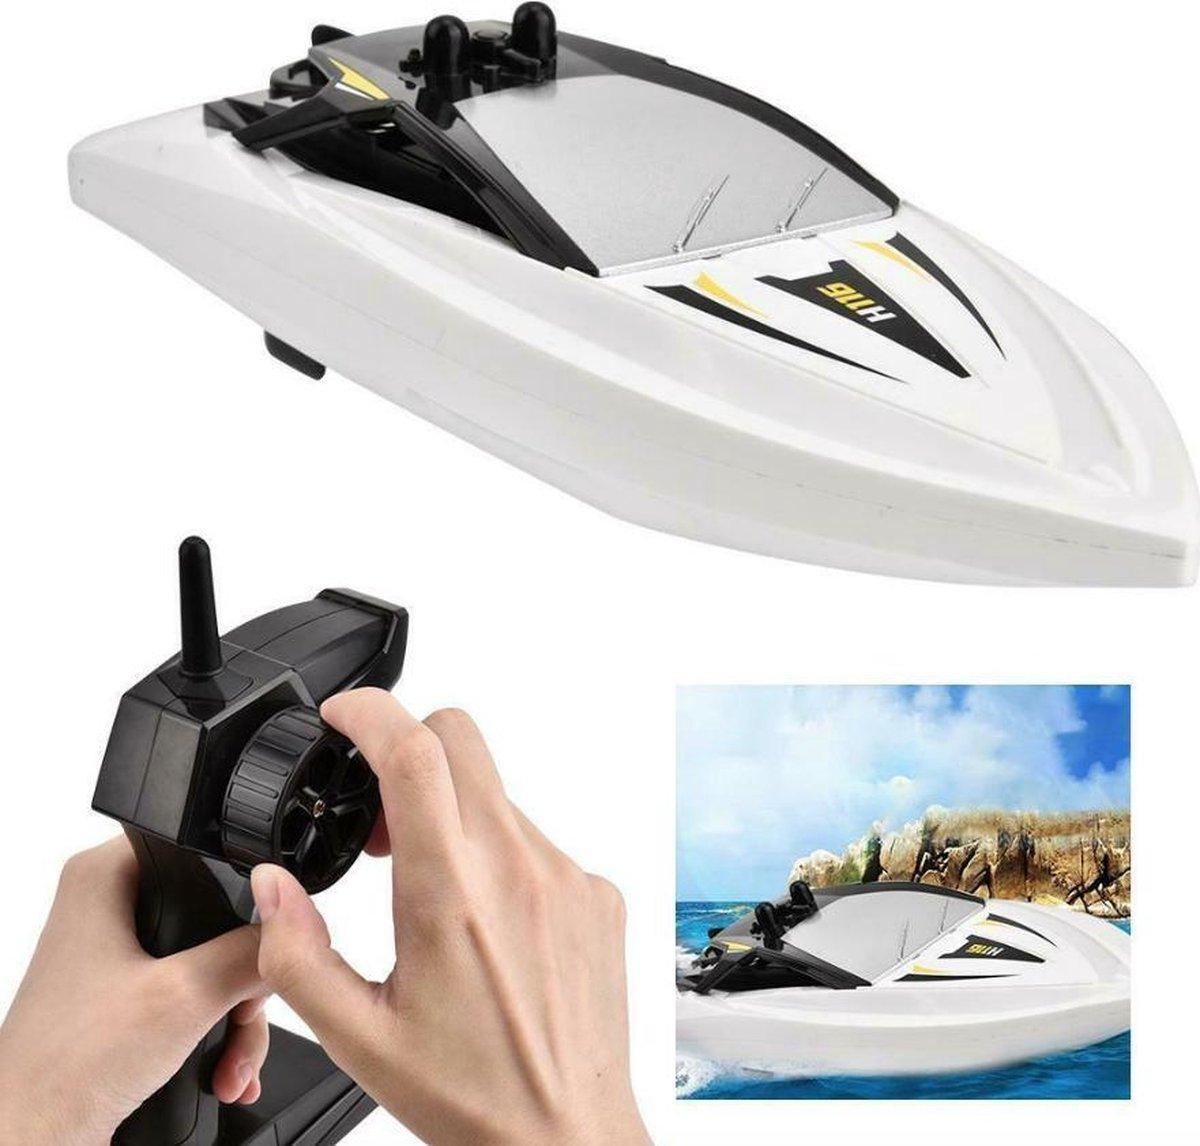 Rc mini Boat - Radiografisch bestuurbaar boot -H116 - 18KM/u